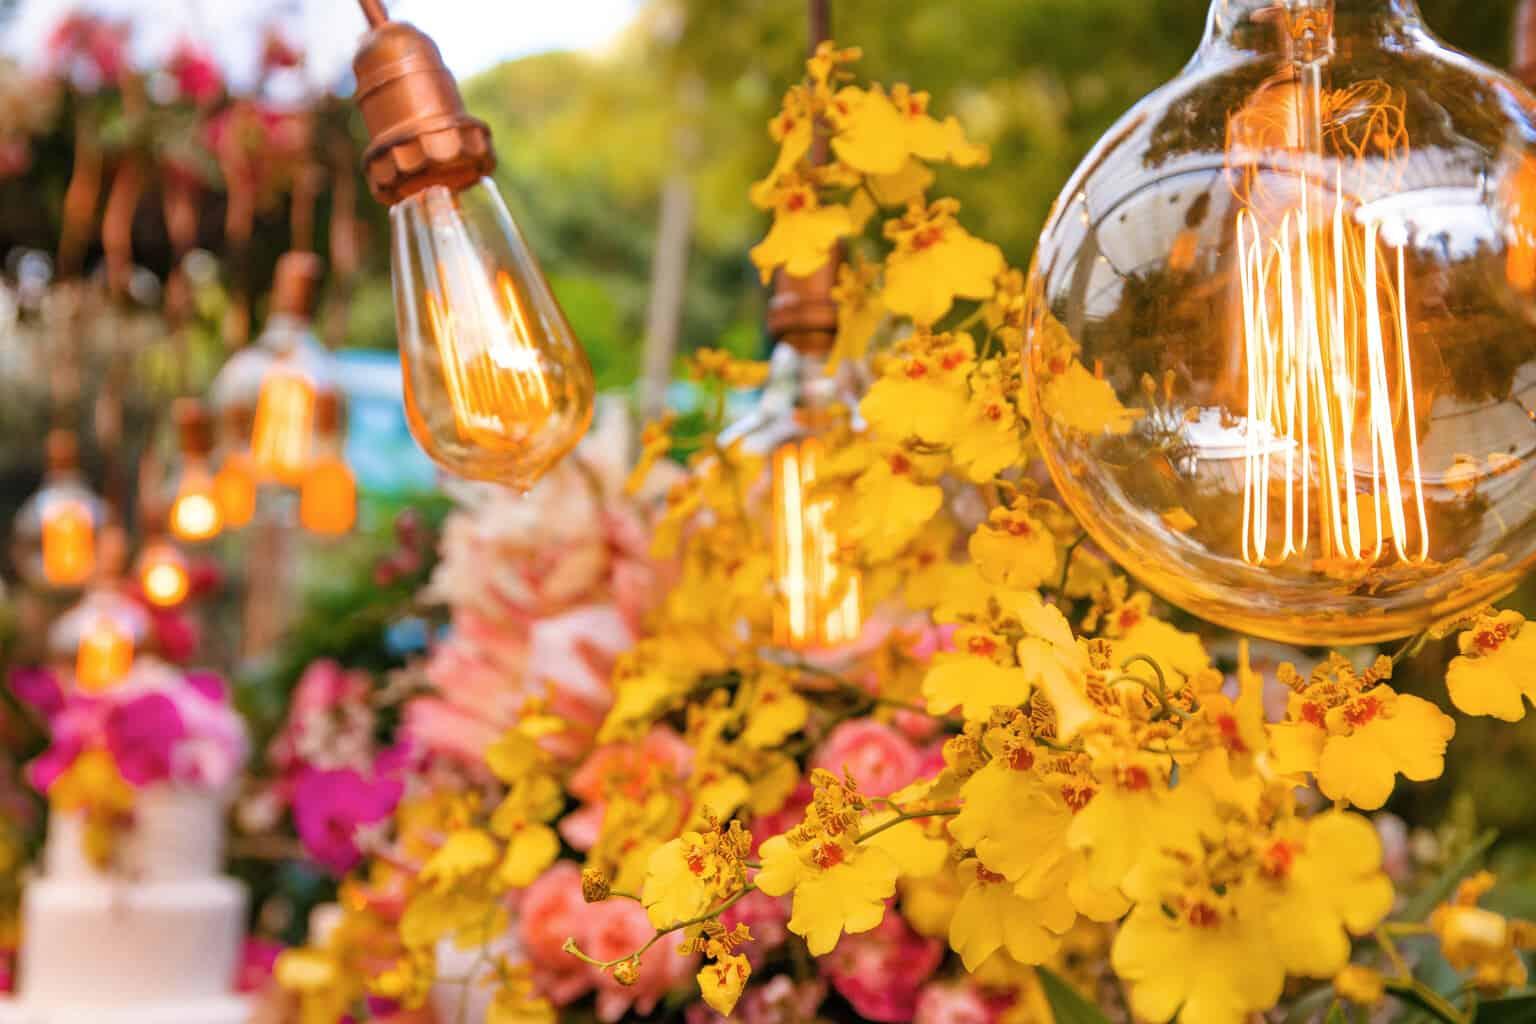 casamento-Beatriz-e-Joao-Fernando-decoracao-colorida-Itaipava-Locanda-Della-Mimosa-Thienny-Tammis80